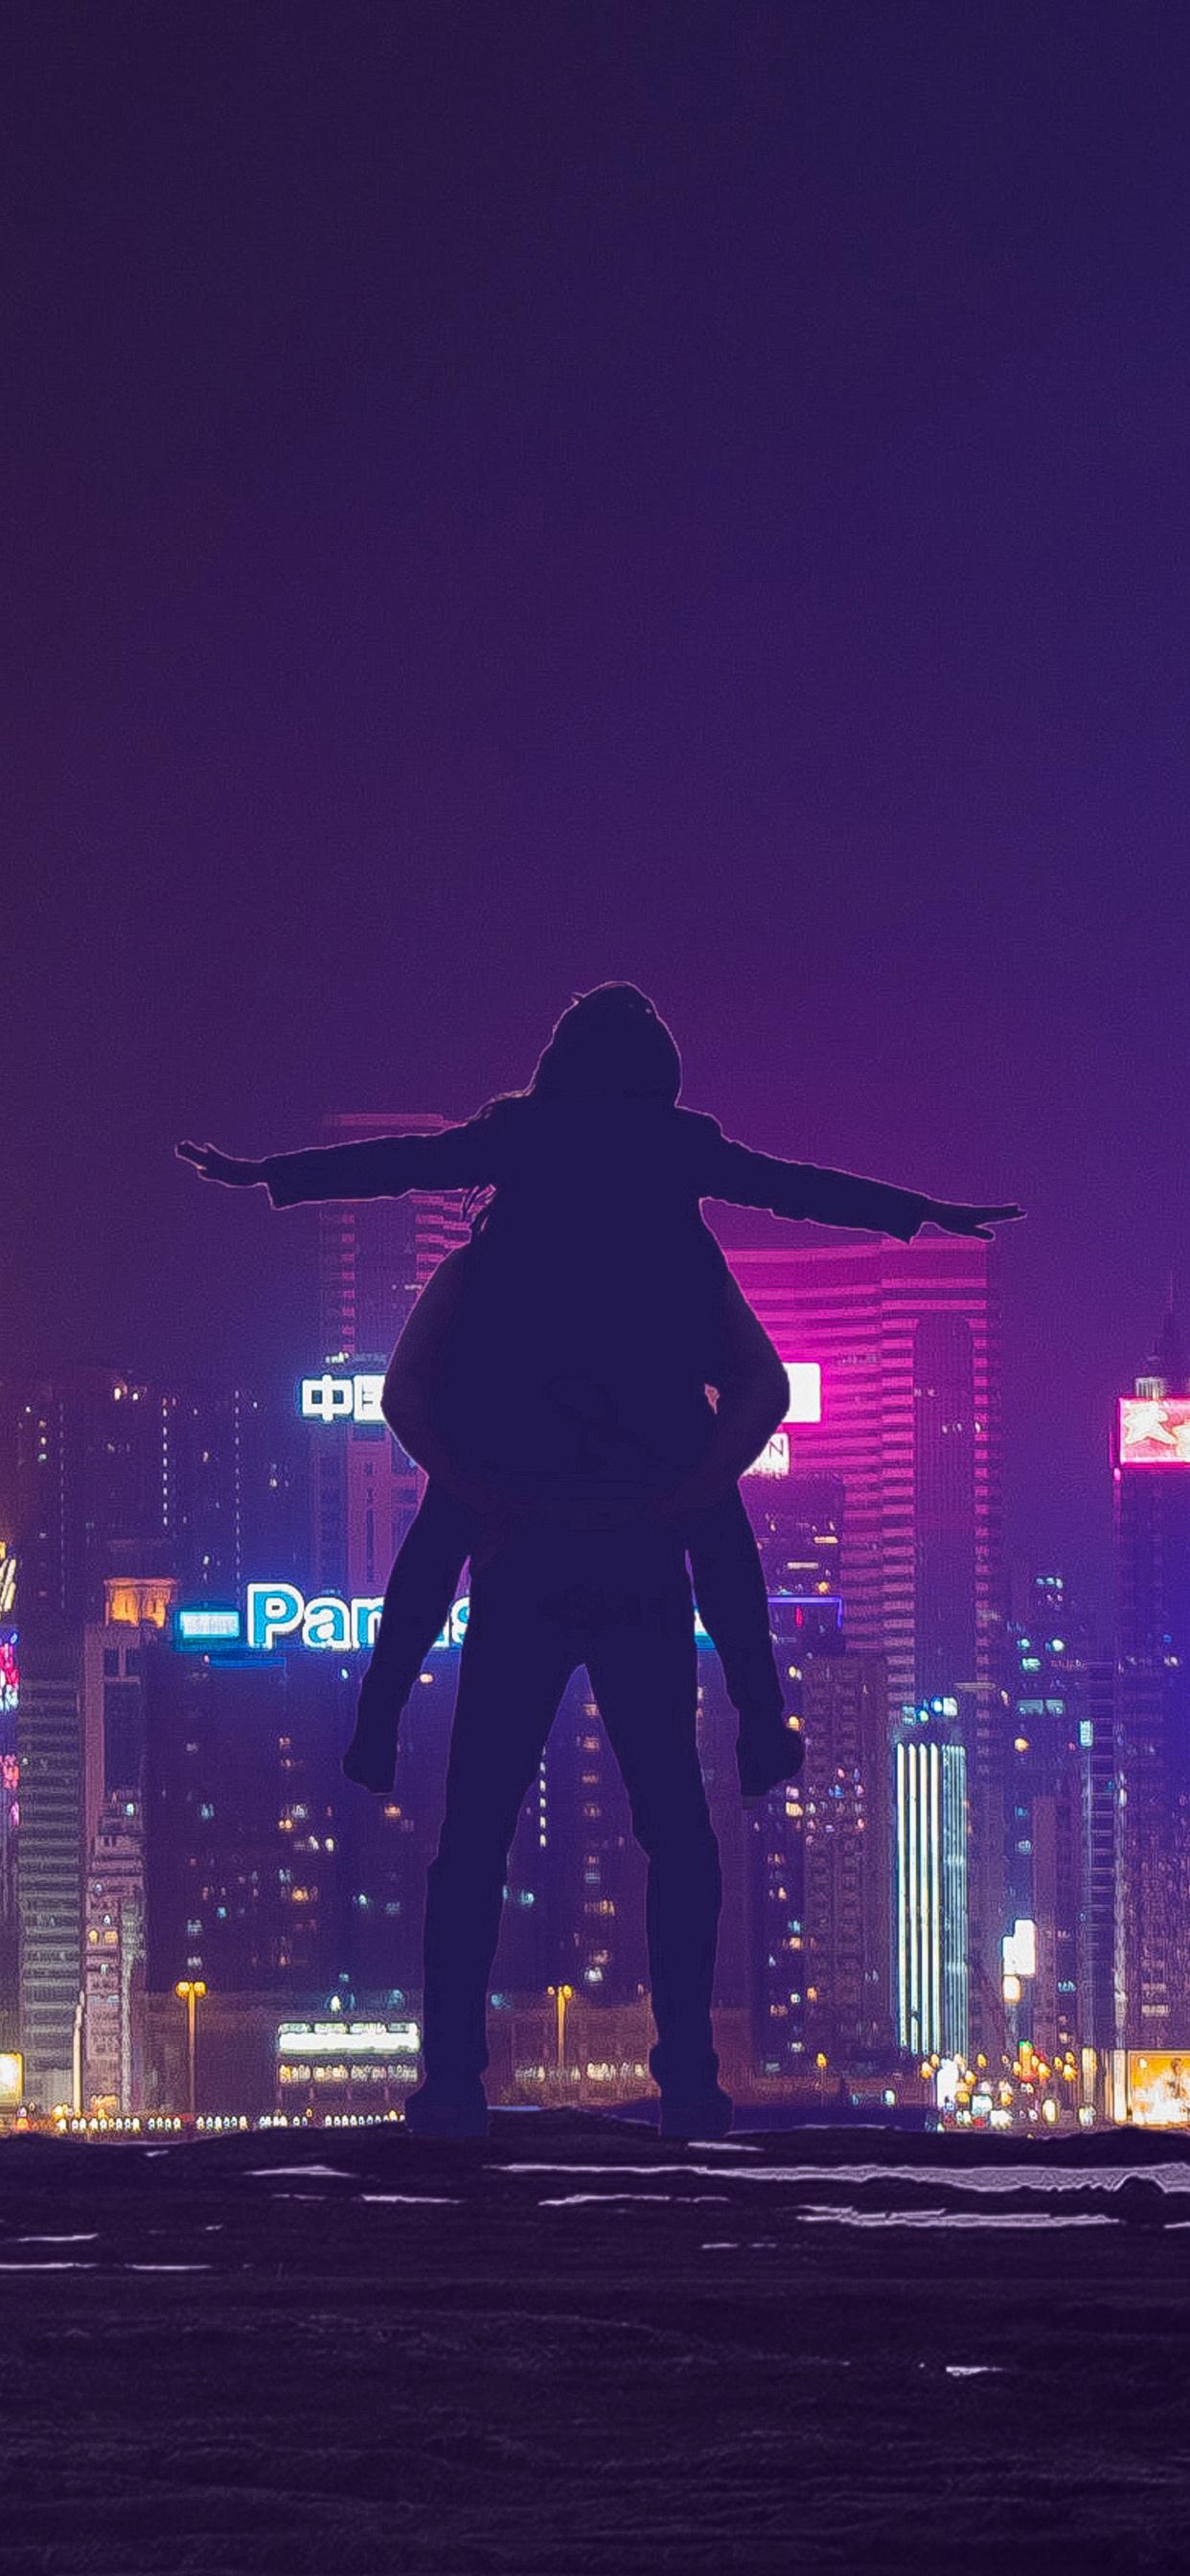 1242x2688 Love Couple Roof City Lights Iphone Xs Max Hd 4k